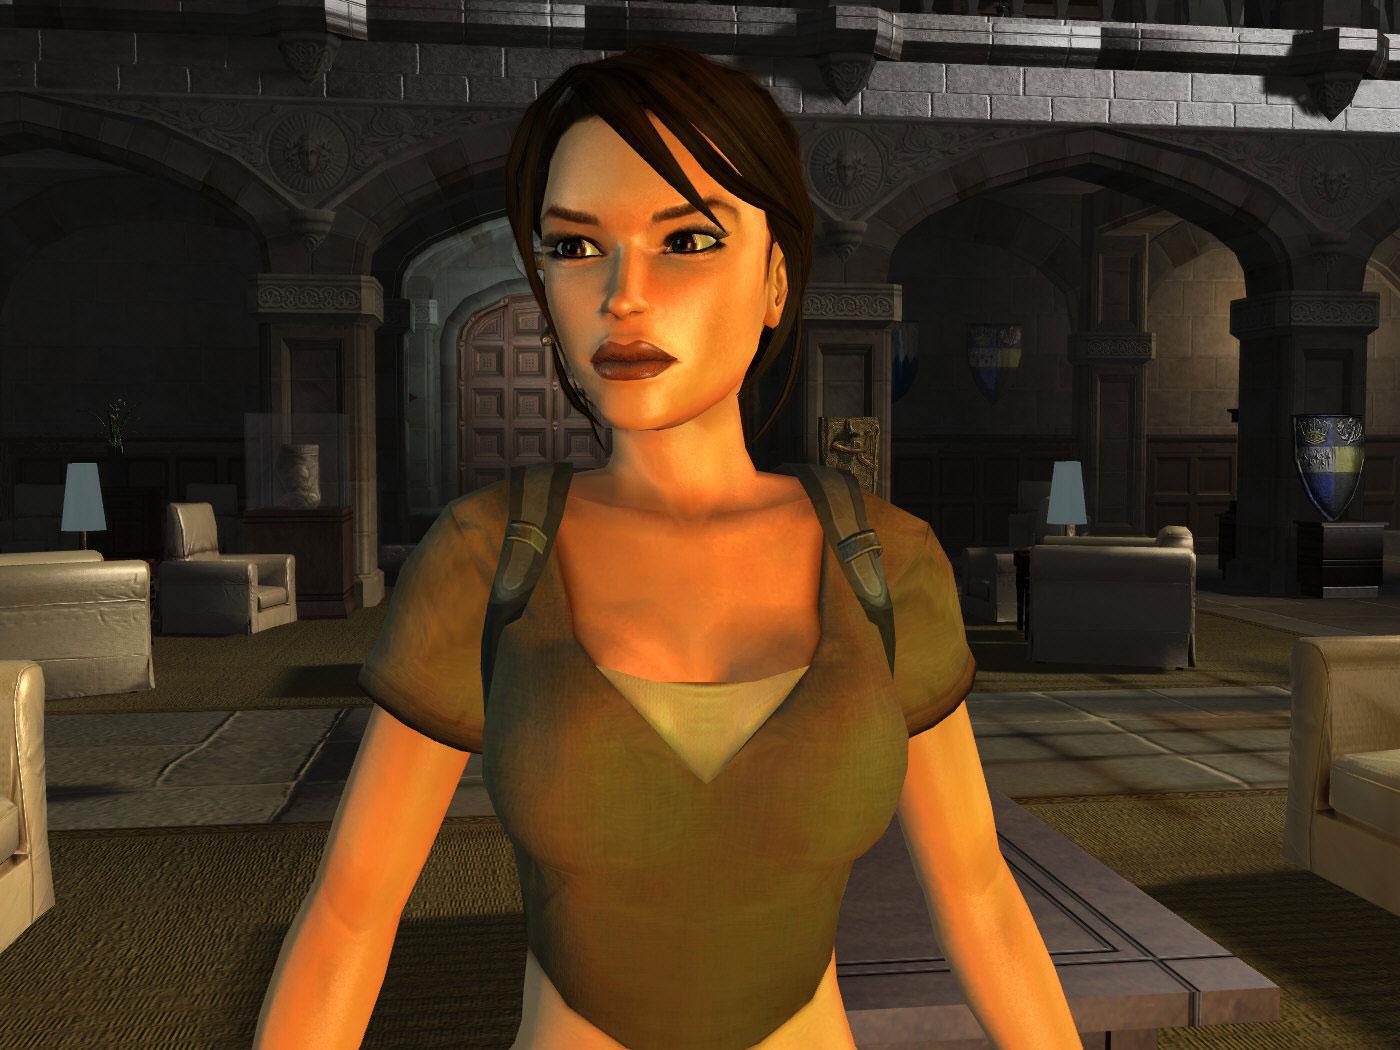 Tomb raider boob mod sex image